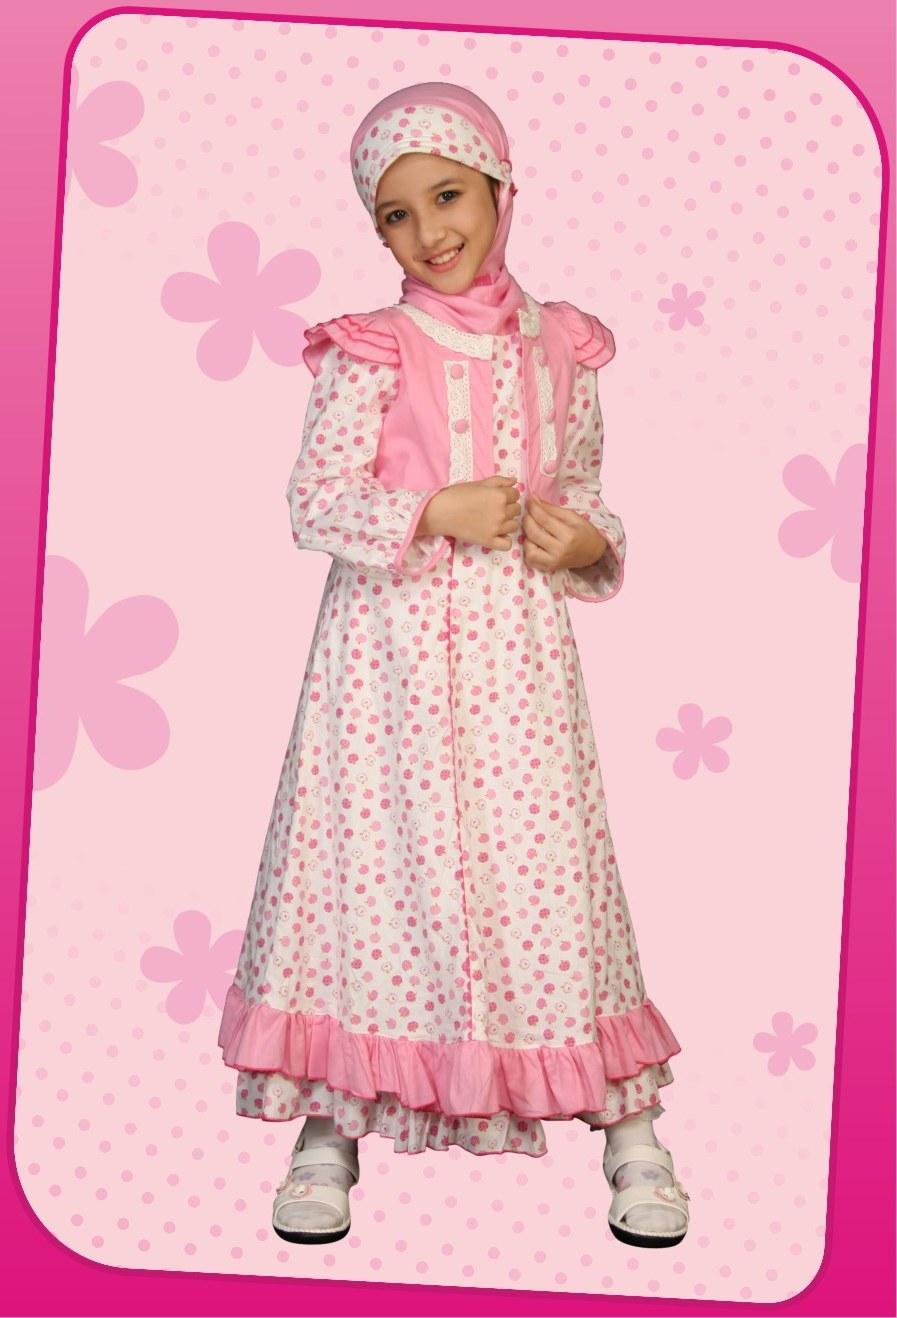 Inspirasi Gambar Baju Lebaran Anak E9dx Be Happy Young Mother Busana Muslim Anak 2 Koleksi